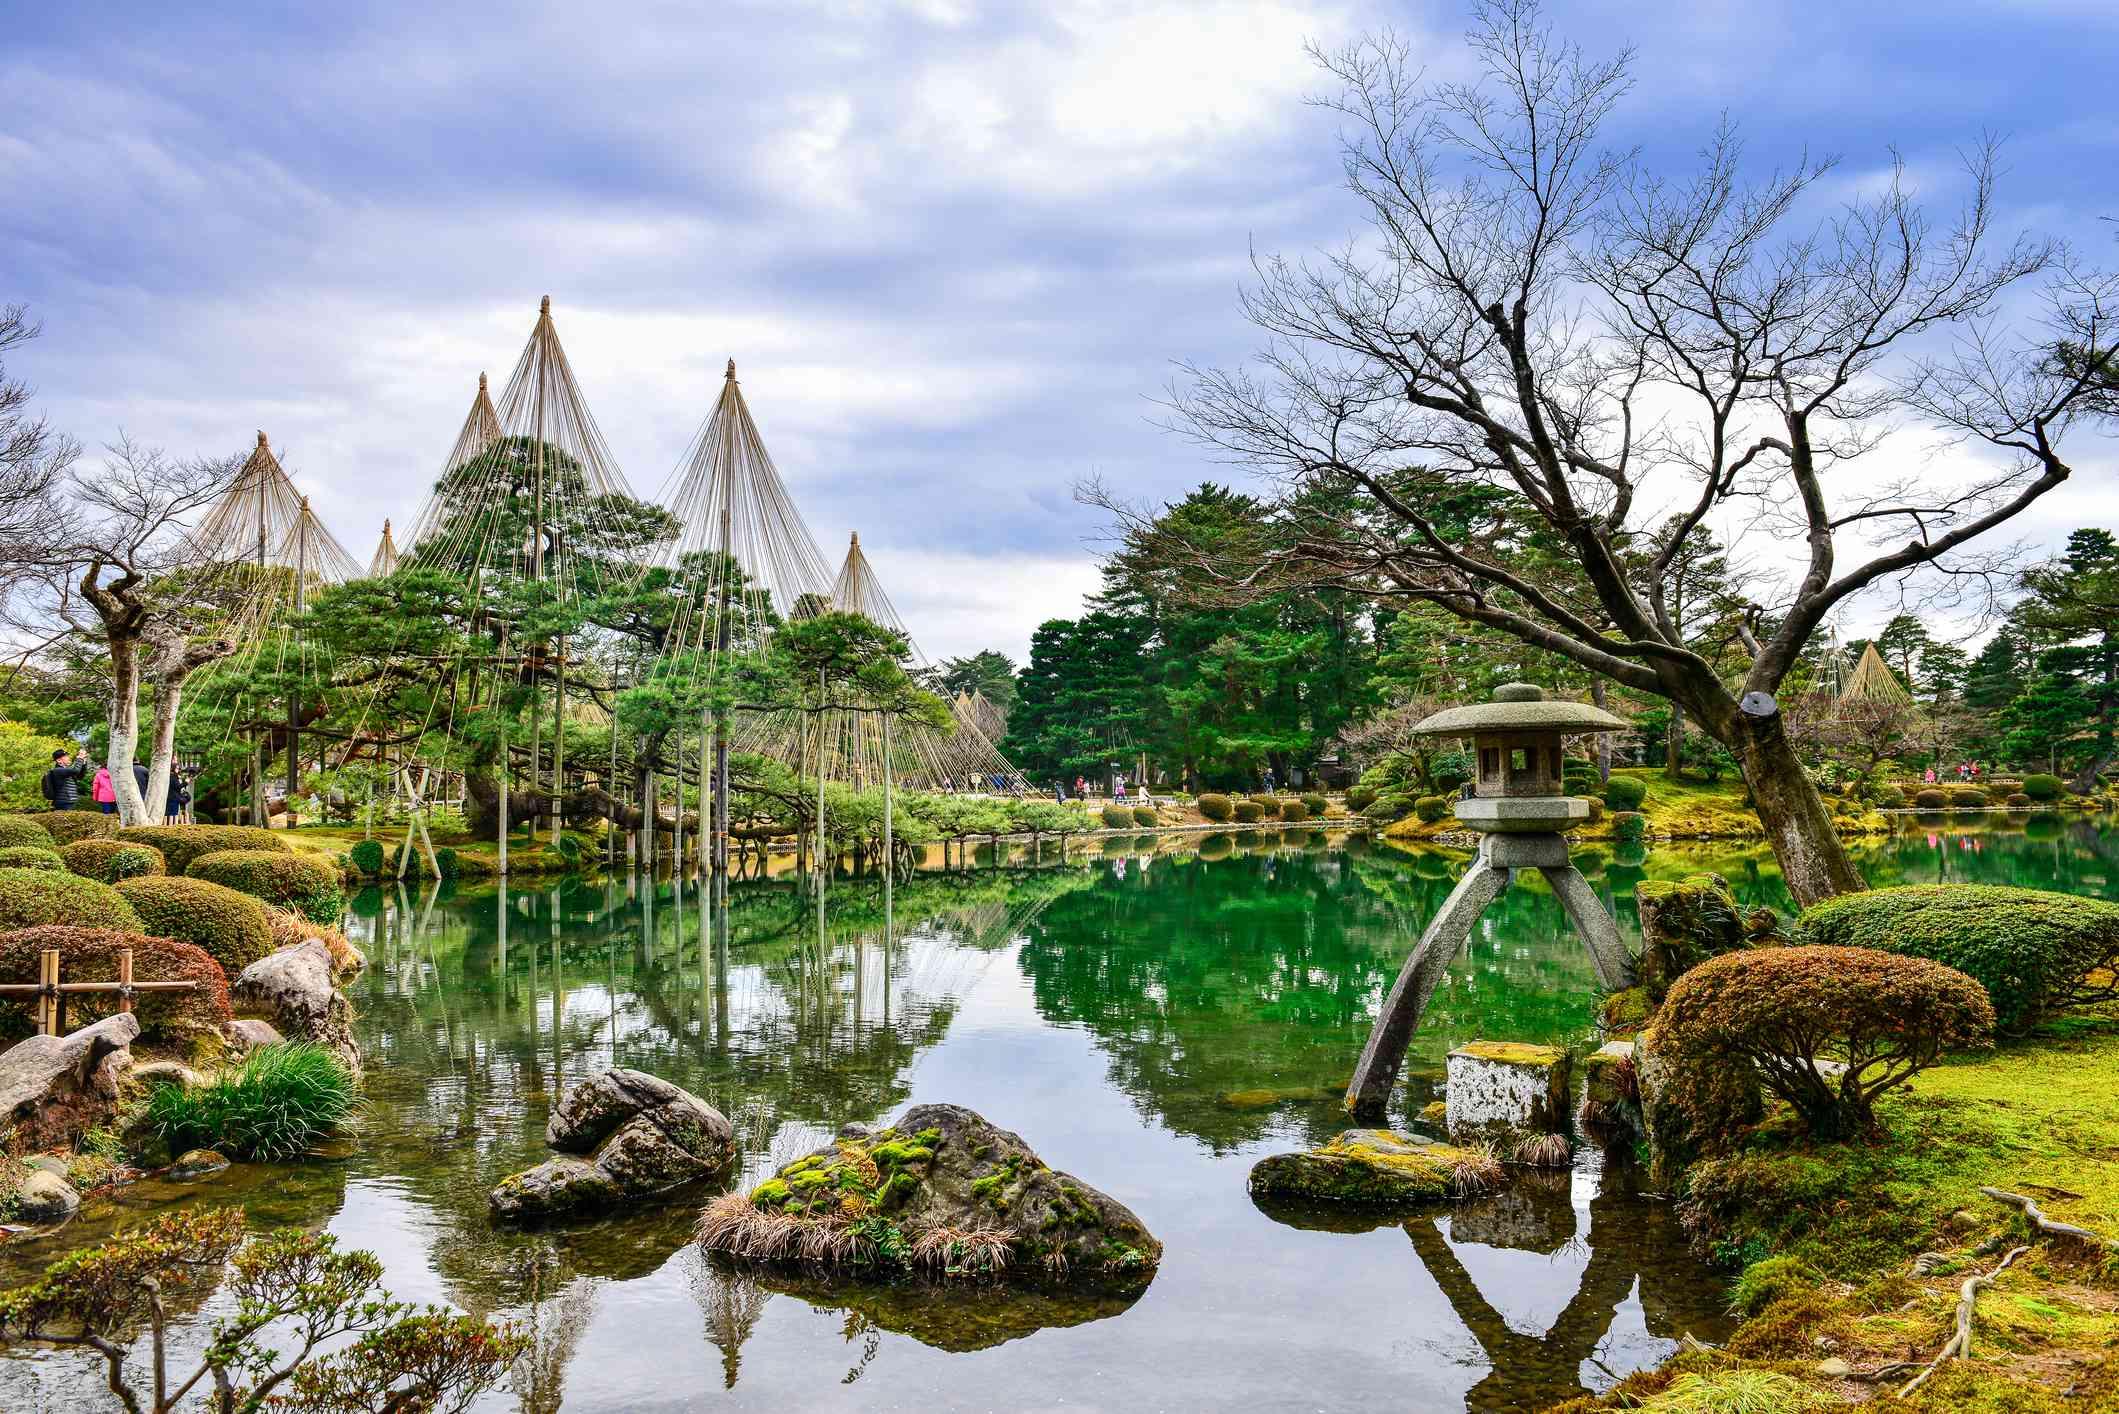 Kenroku-en l garden and pond in Kanazawa, Ishikawa, Japan